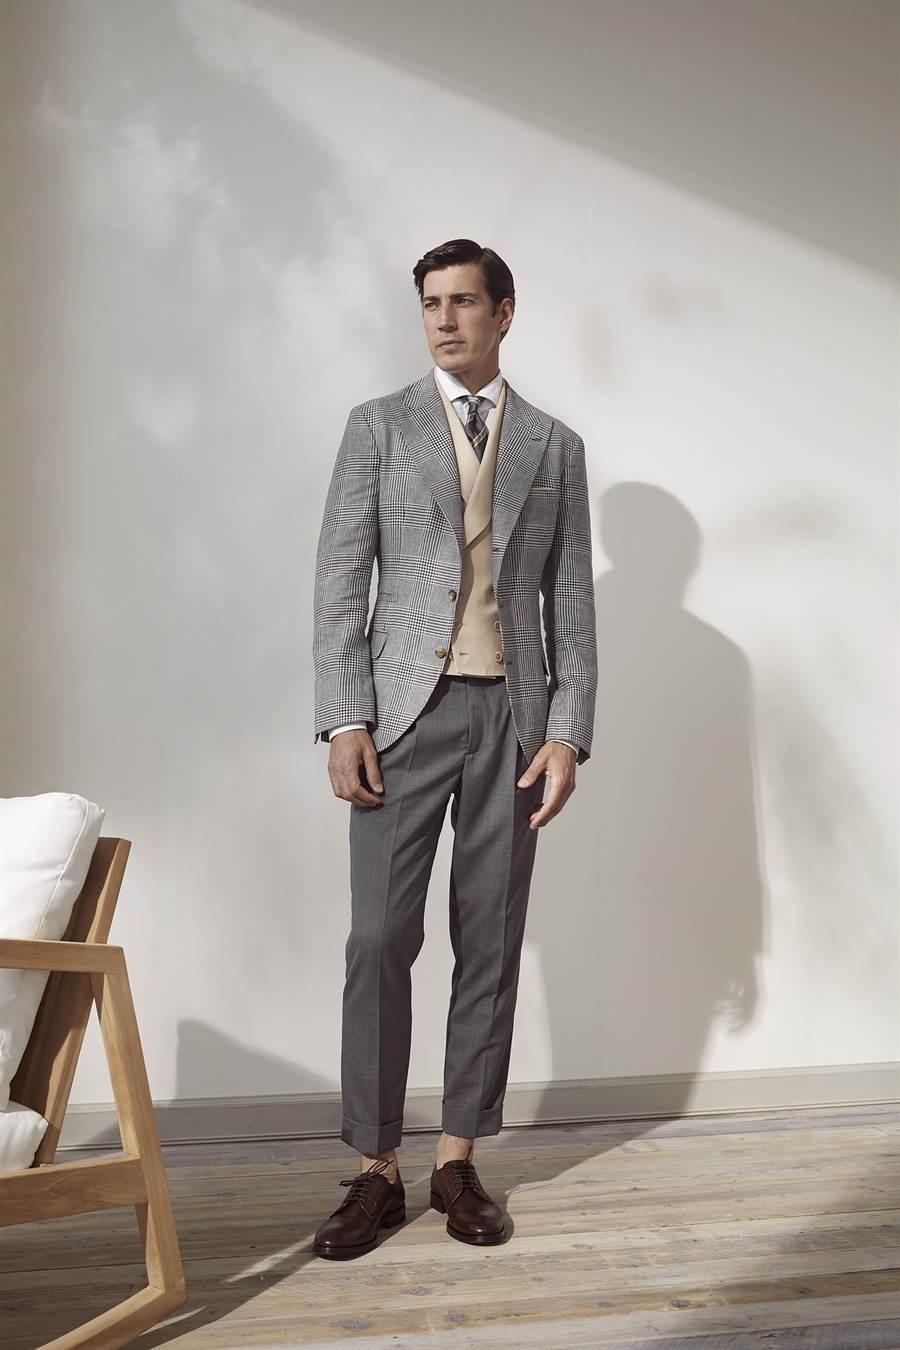 BRUNELLO CUCINELLI春夏劍領格紋西外套12萬8600元,雙排釦羊毛西裝背心6萬1900元,其他價格店洽。(BRUNELLO CUCINELLI提供)